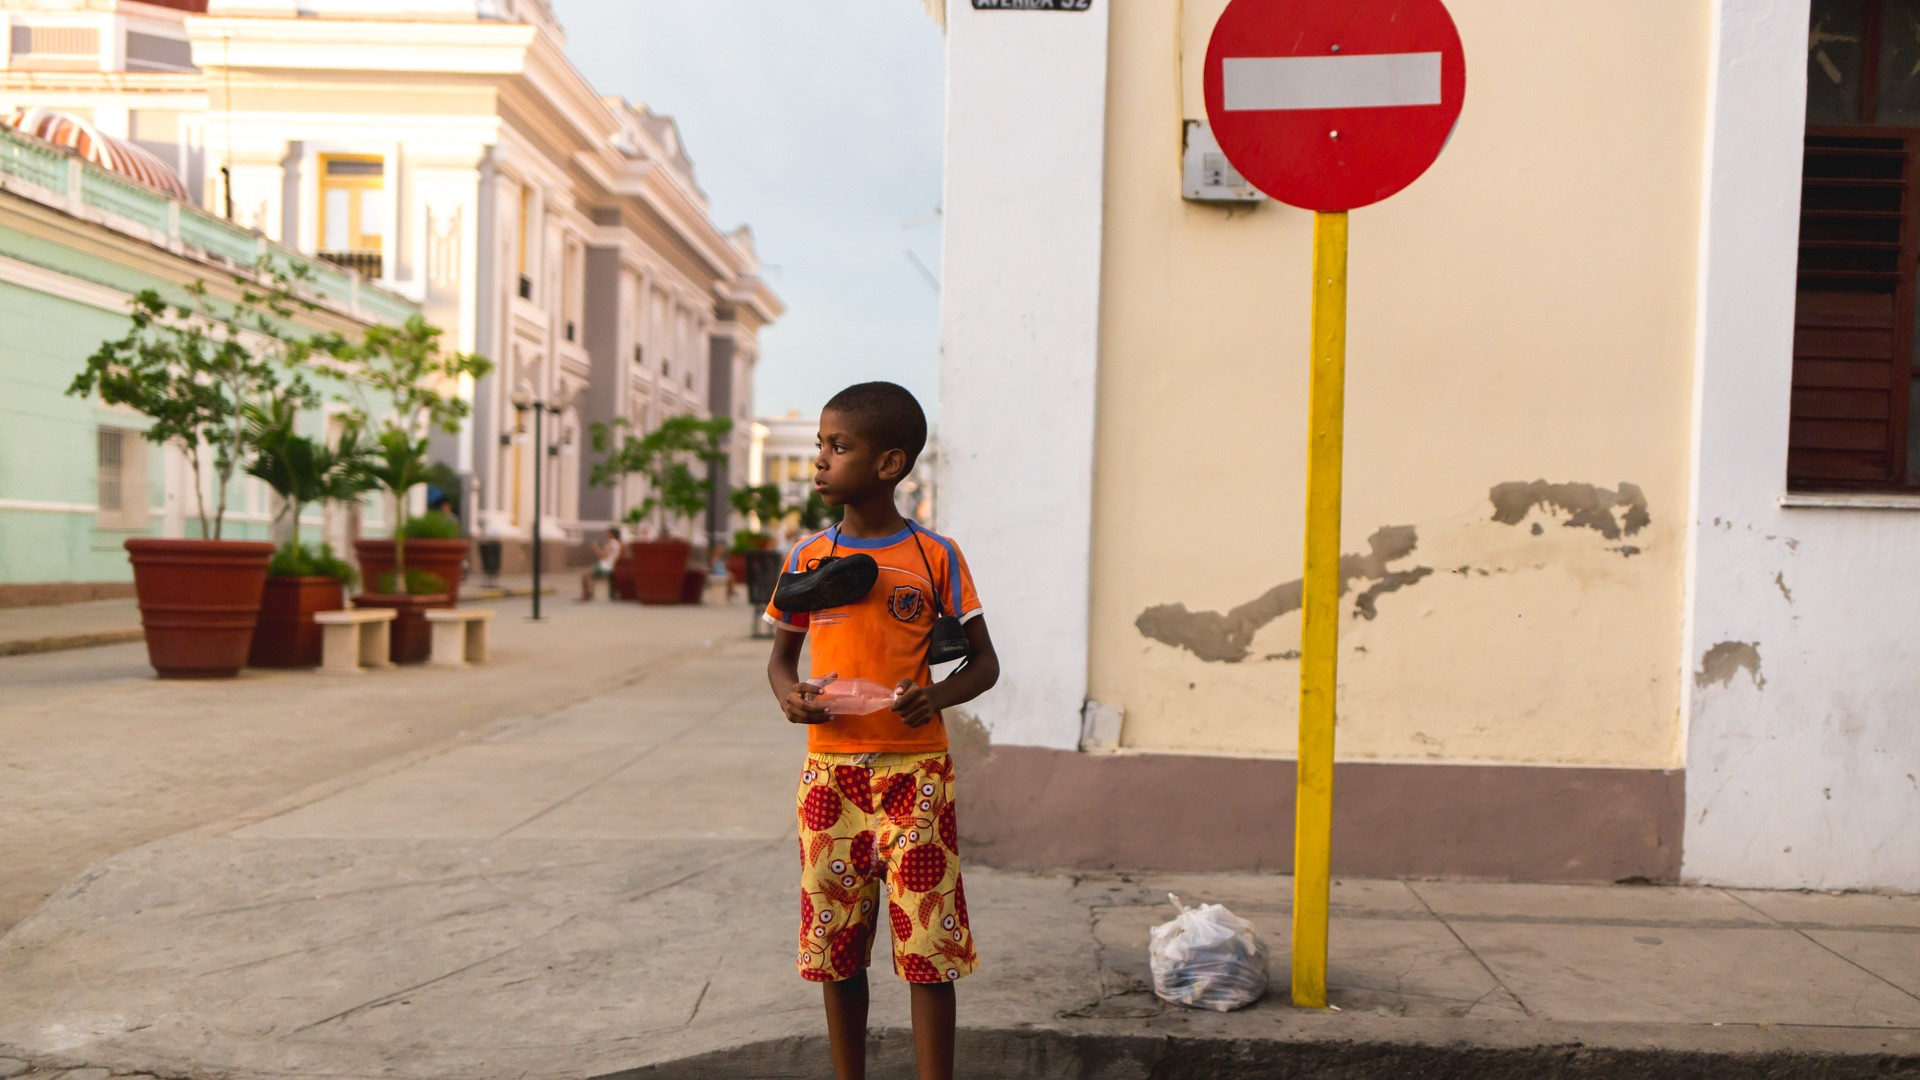 Damien-Dohmen-Photographe-Cuba-47